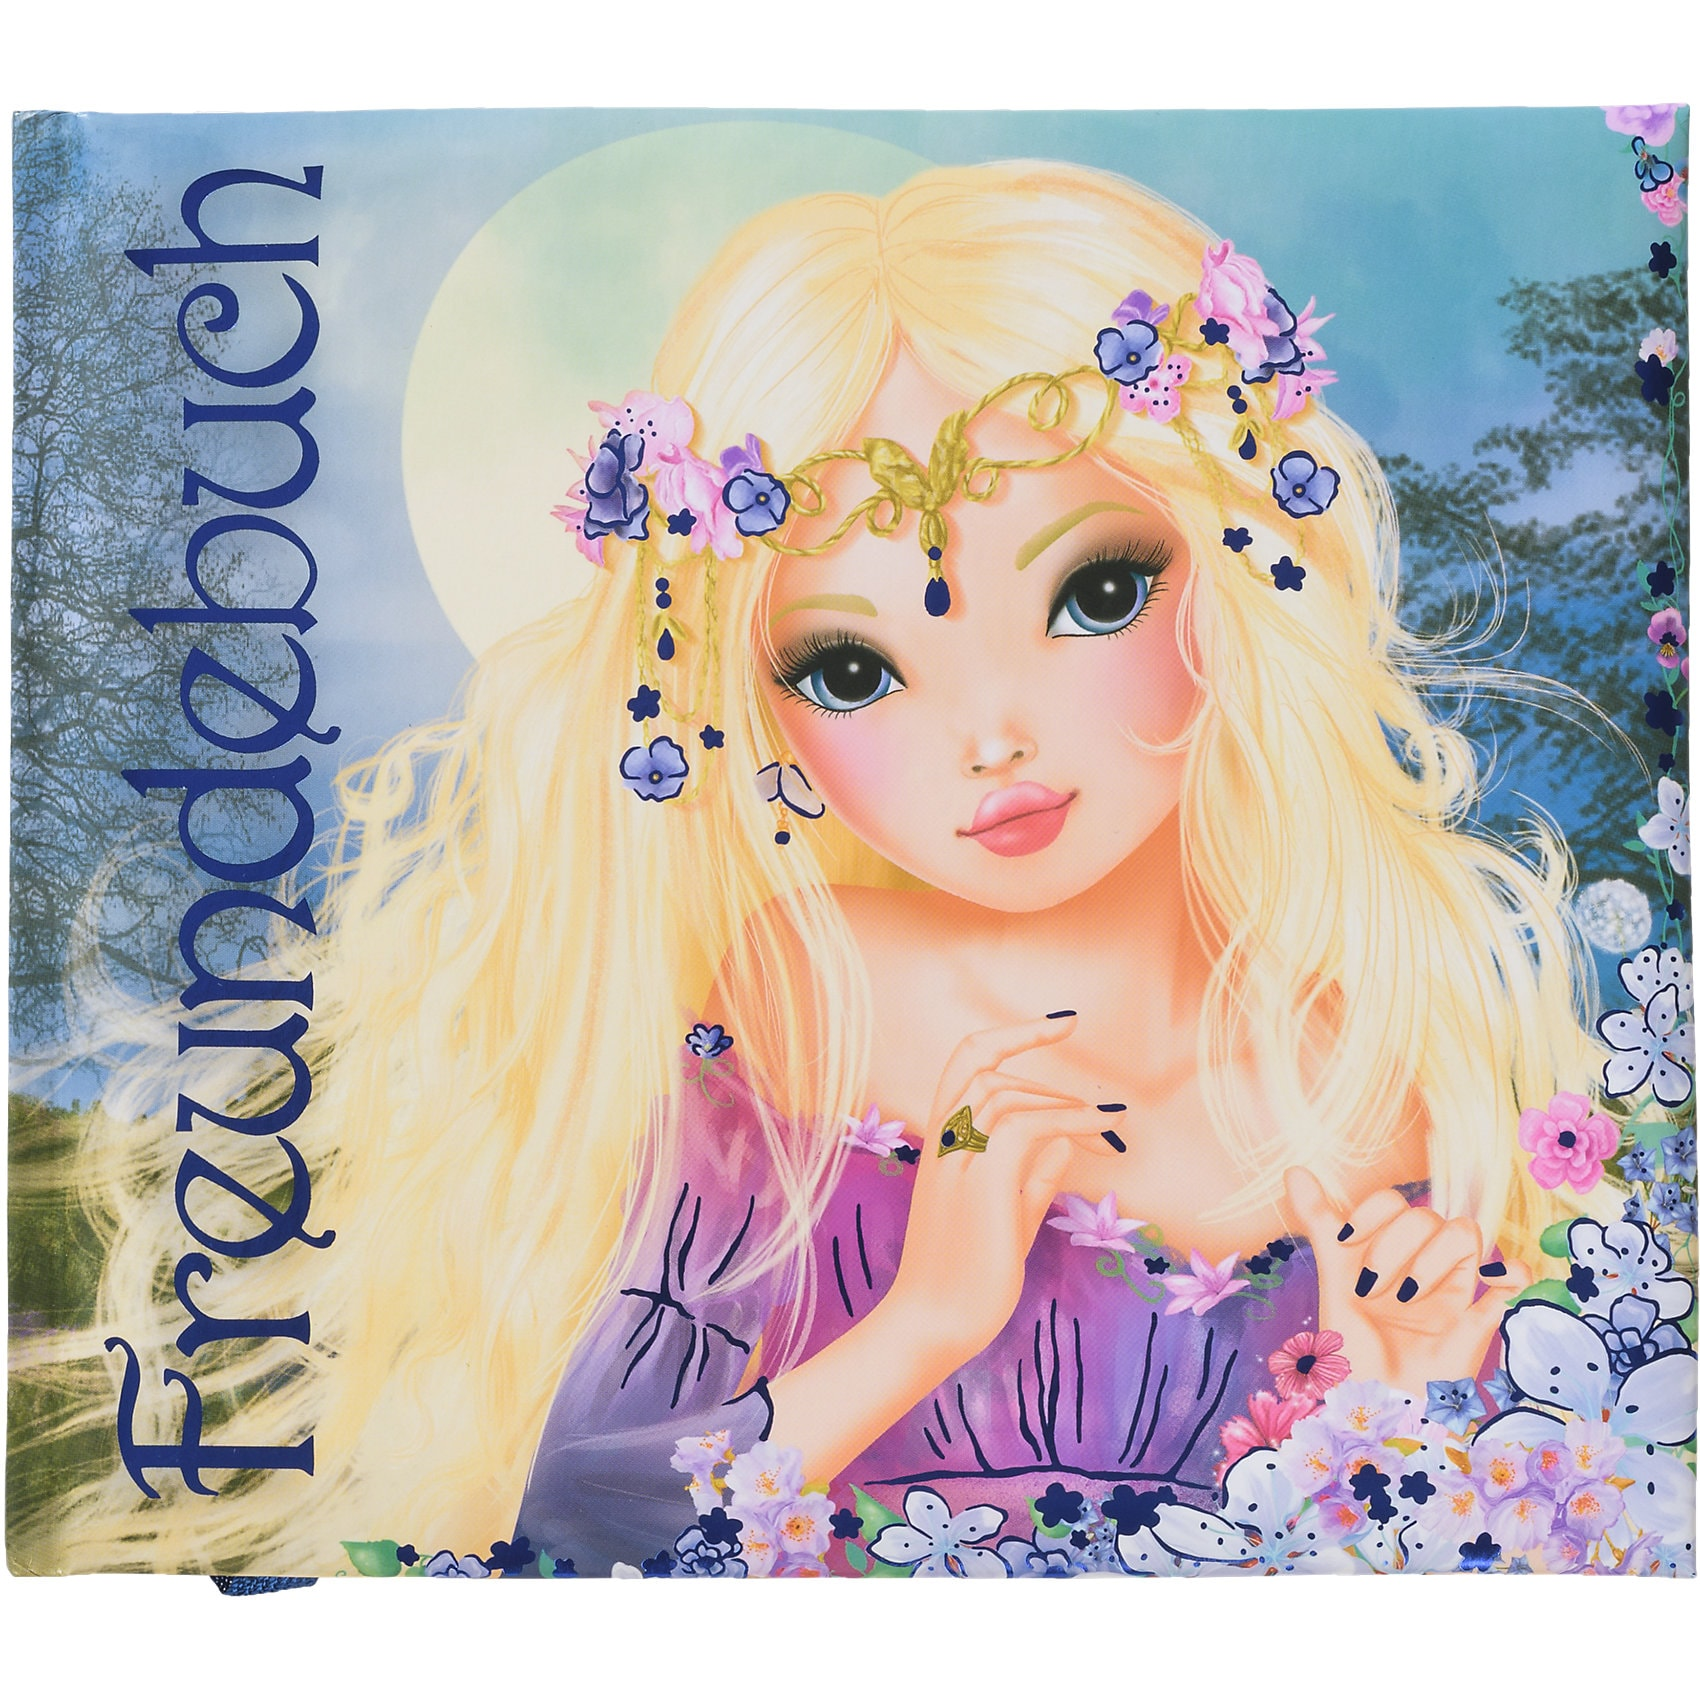 Depesche Freundebuch Fantasy Model